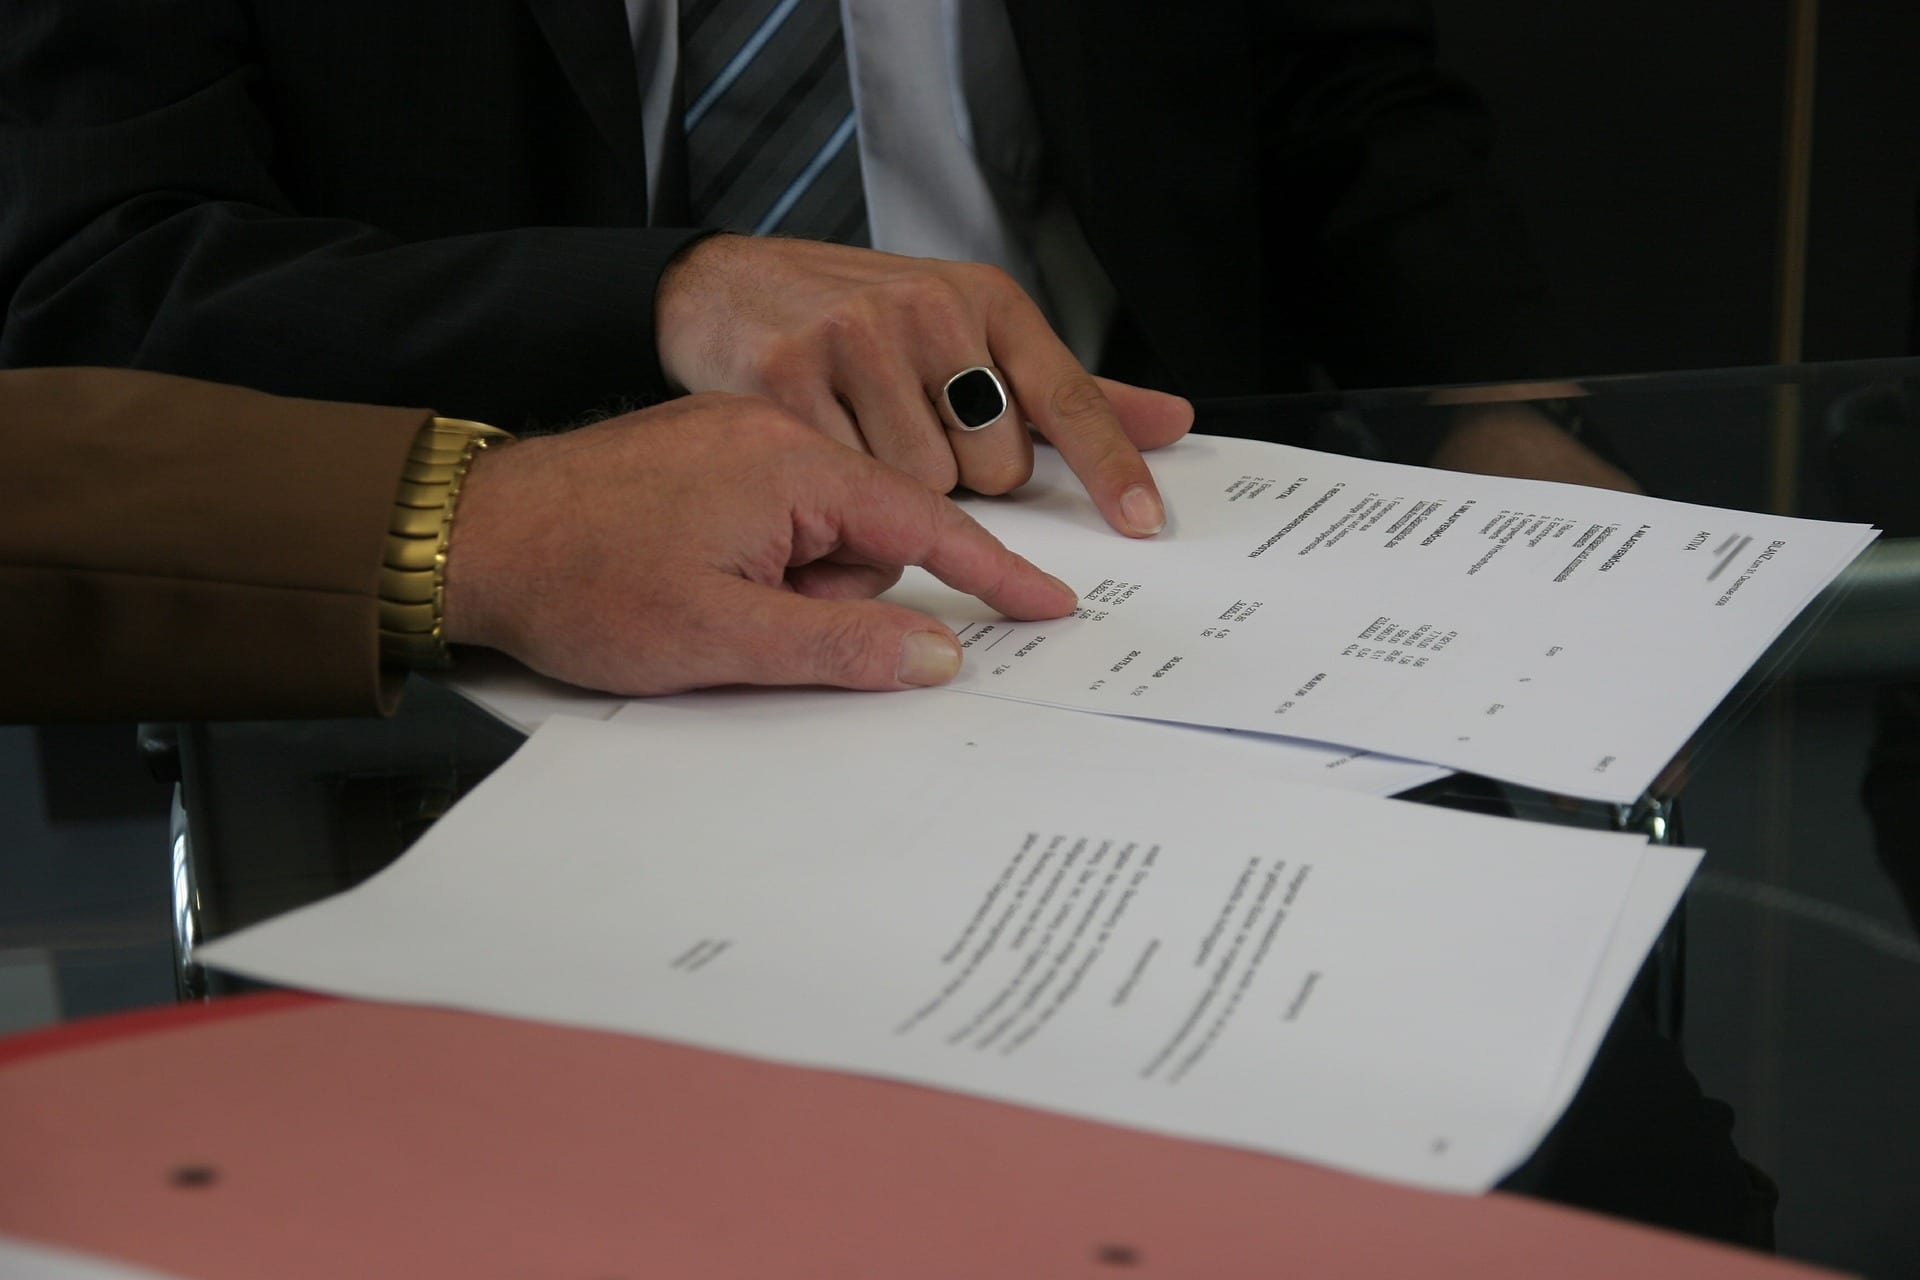 Conciliazione in sede sindacale, verbale inoppugnabile dalle parti